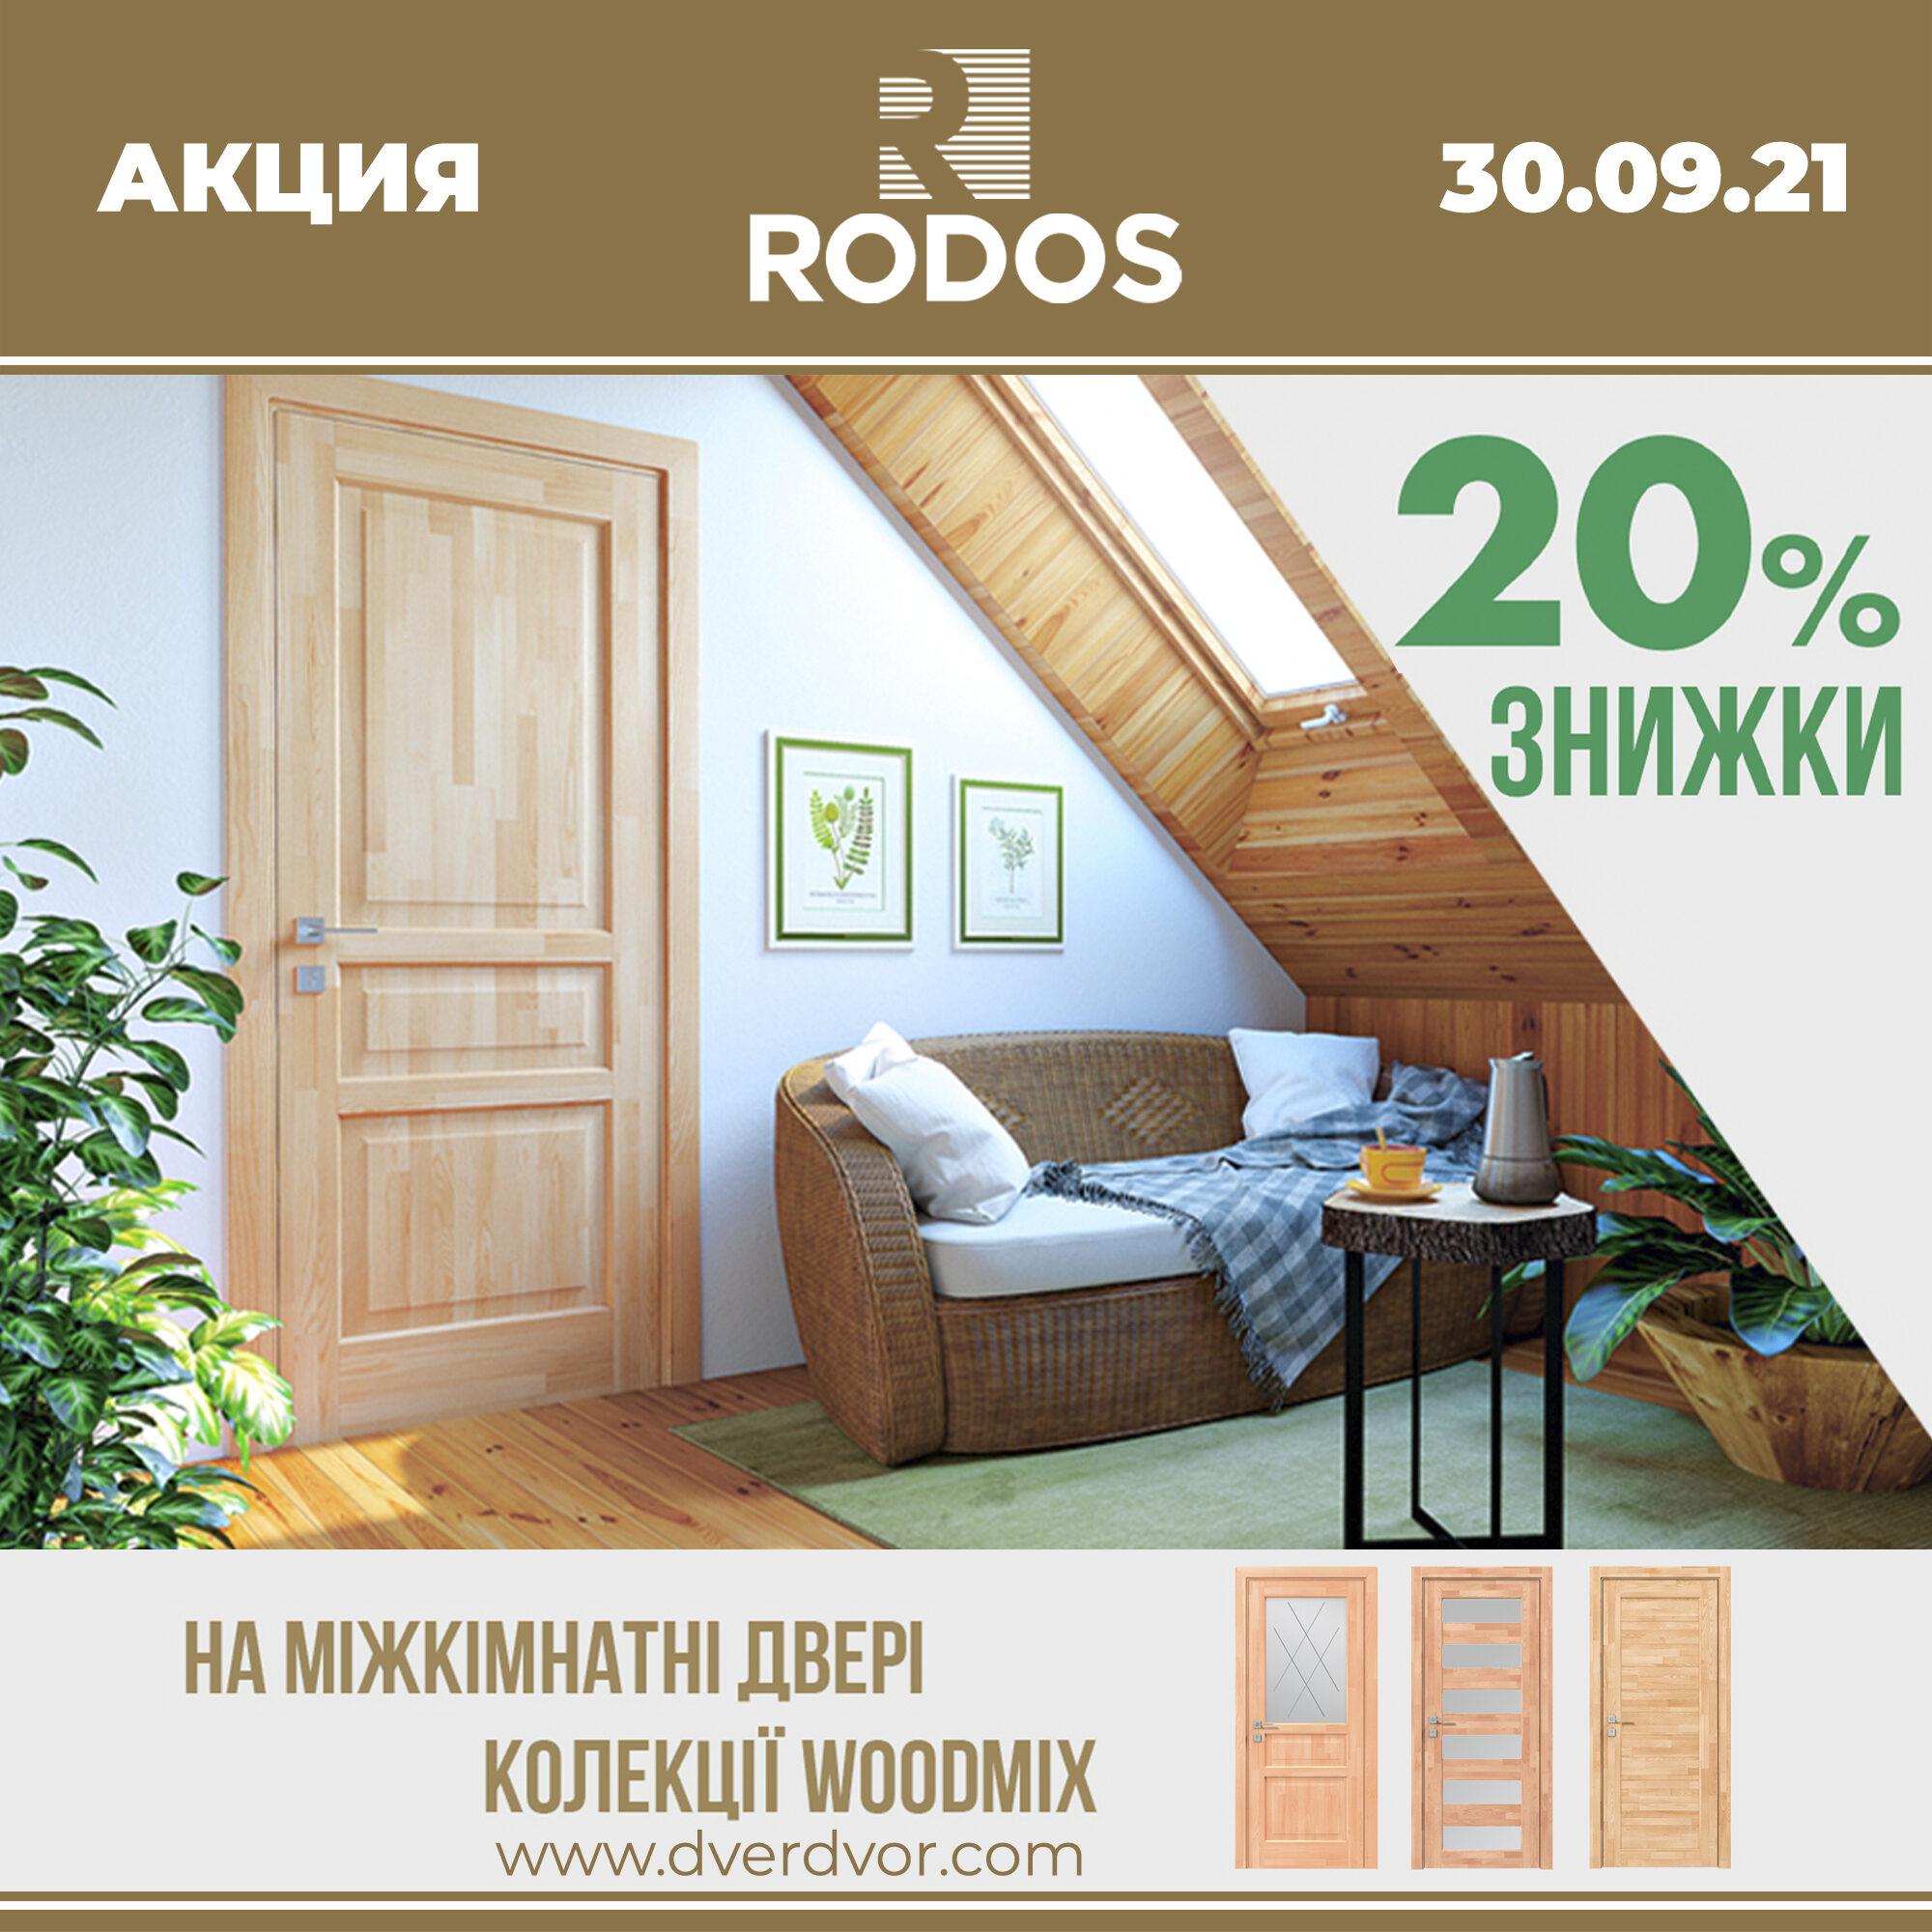 30.09.2021 Rodos Woodmix